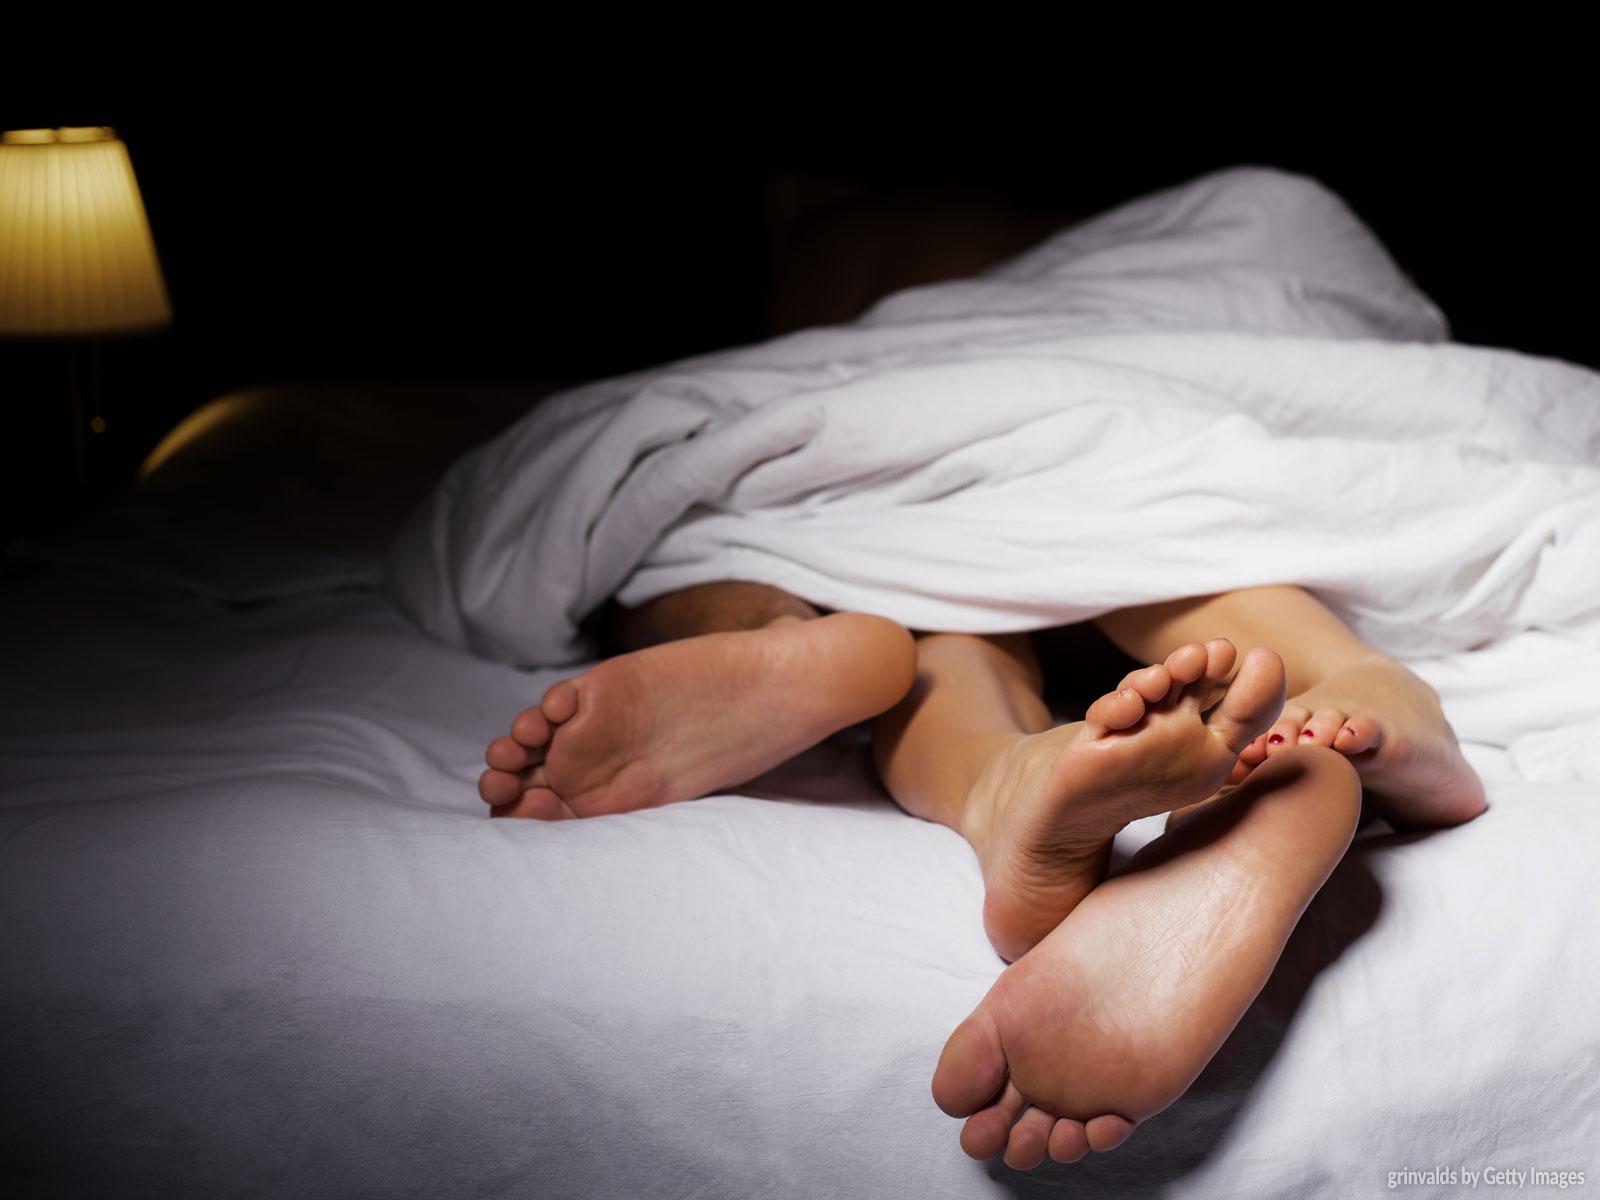 Por-que-a-prática-do-sexo-antes-do-casamento-é-pecado